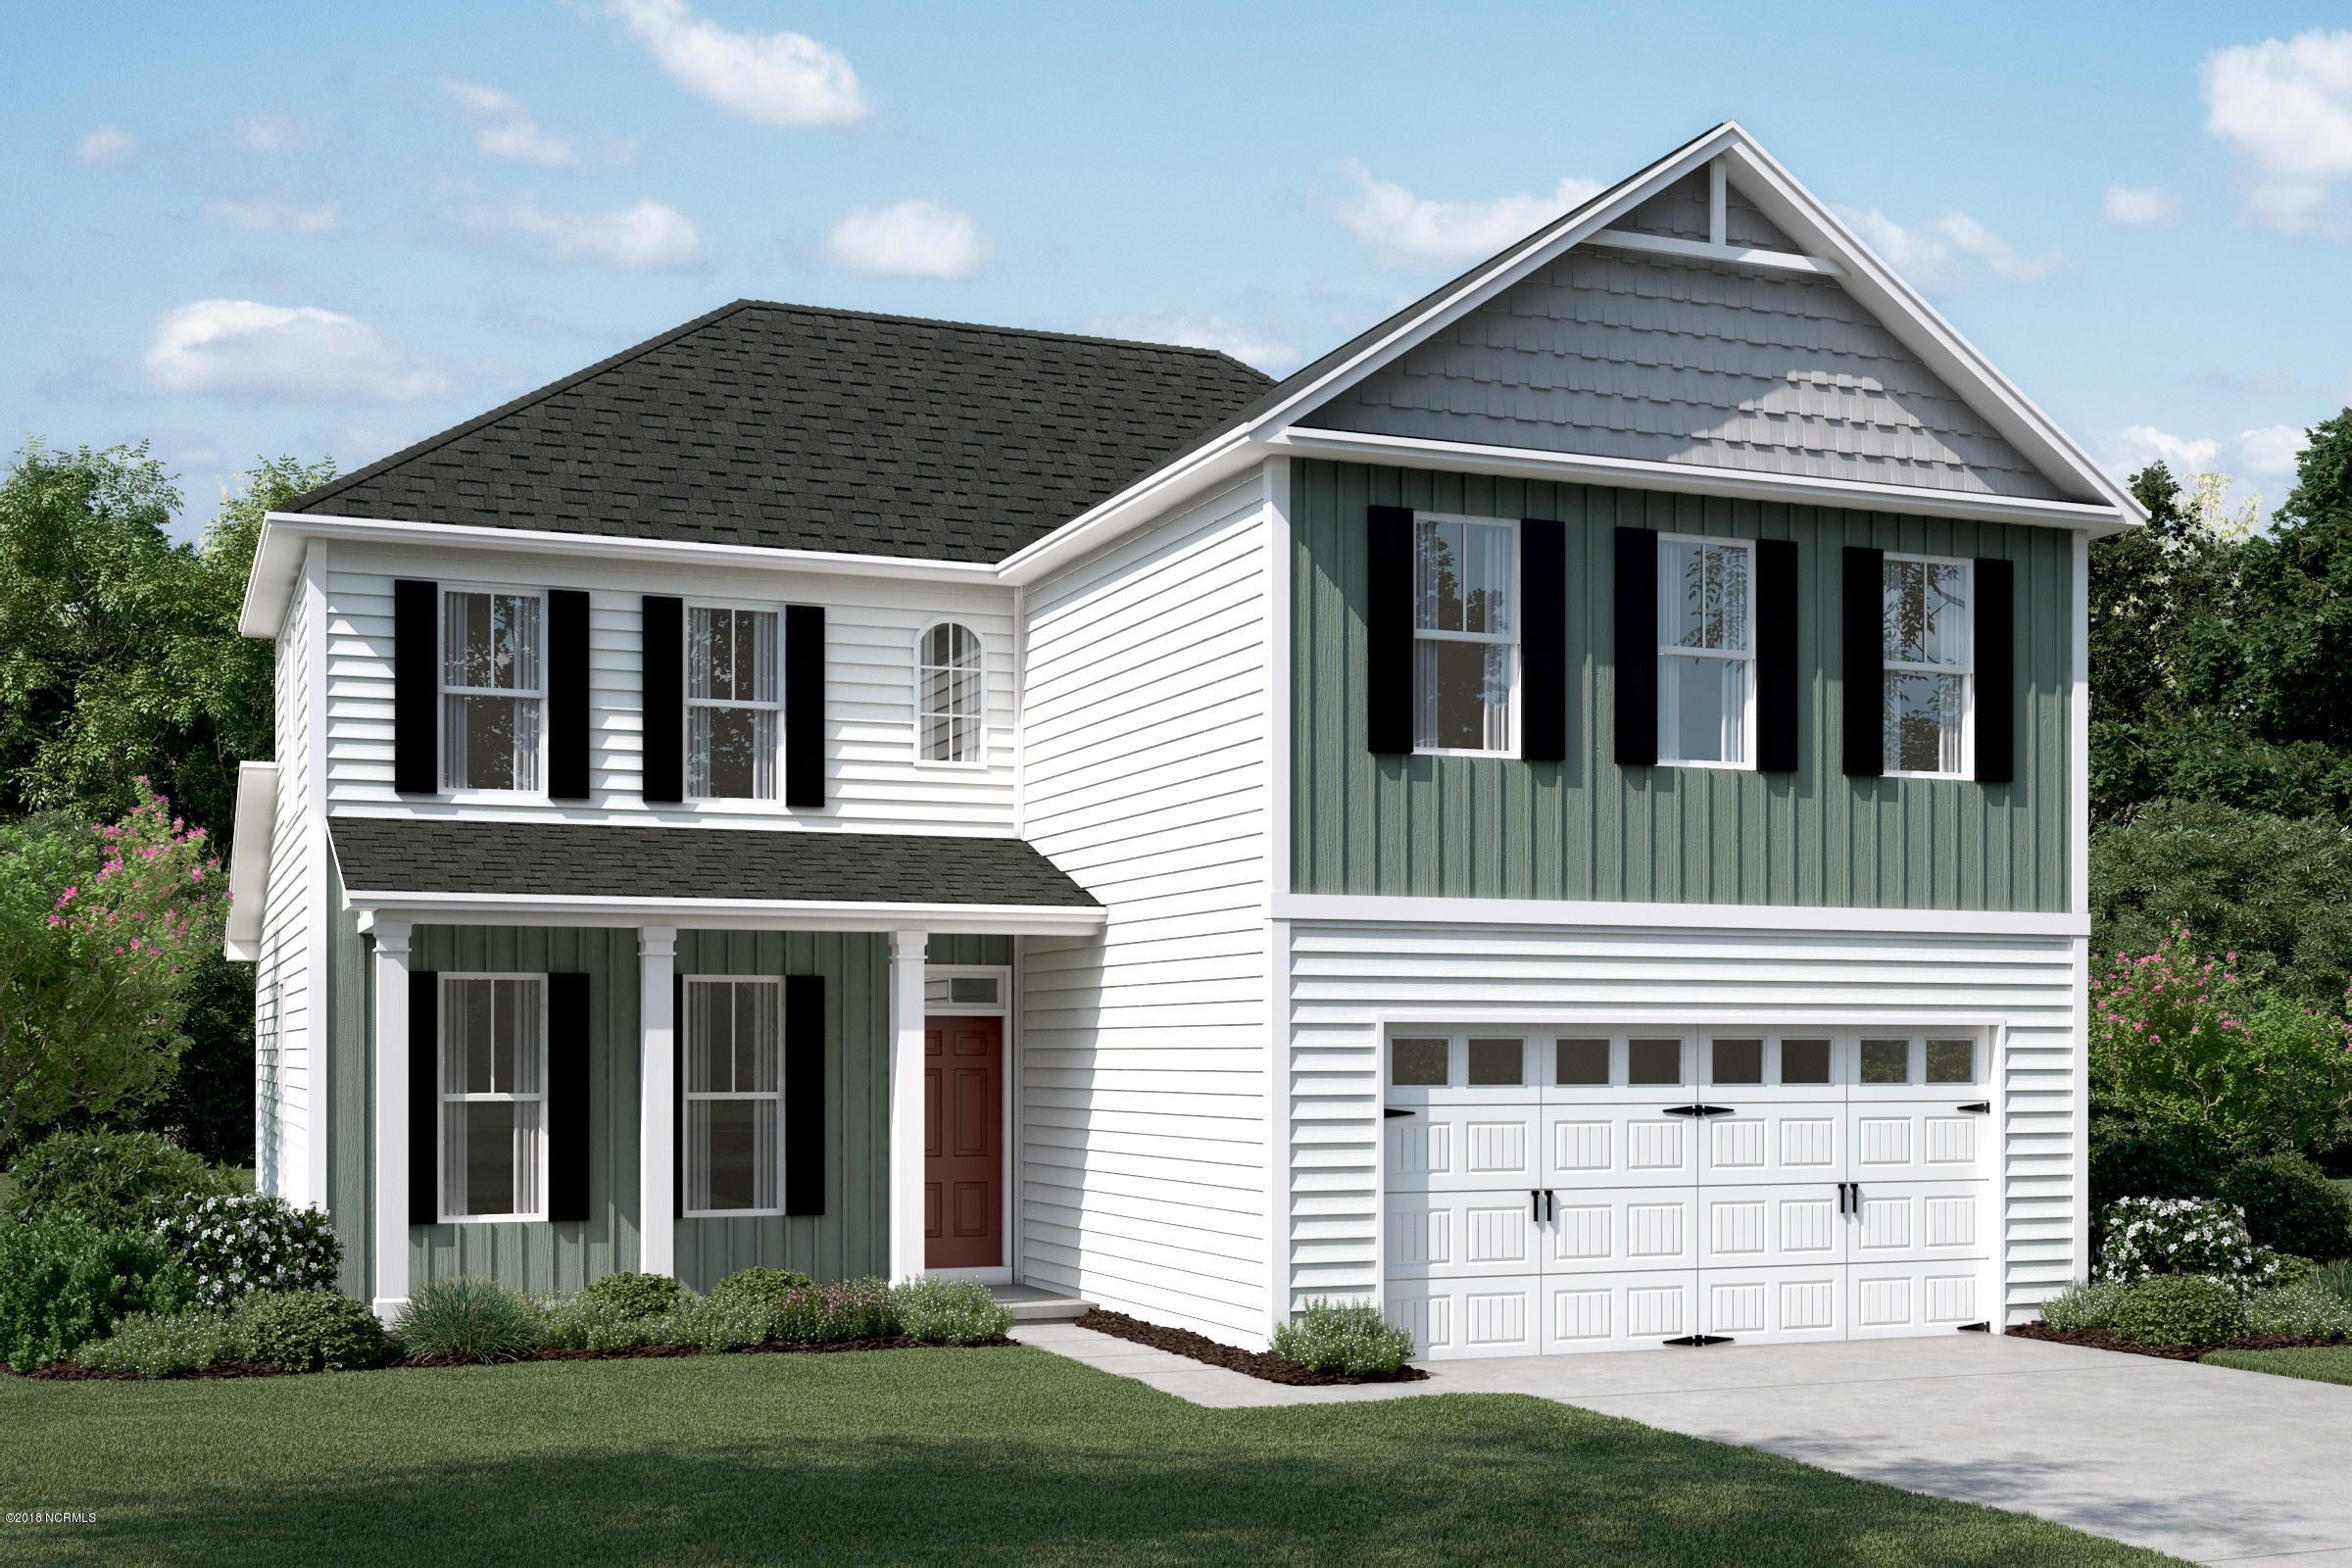 Carolina Plantations Real Estate - MLS Number: 100115704